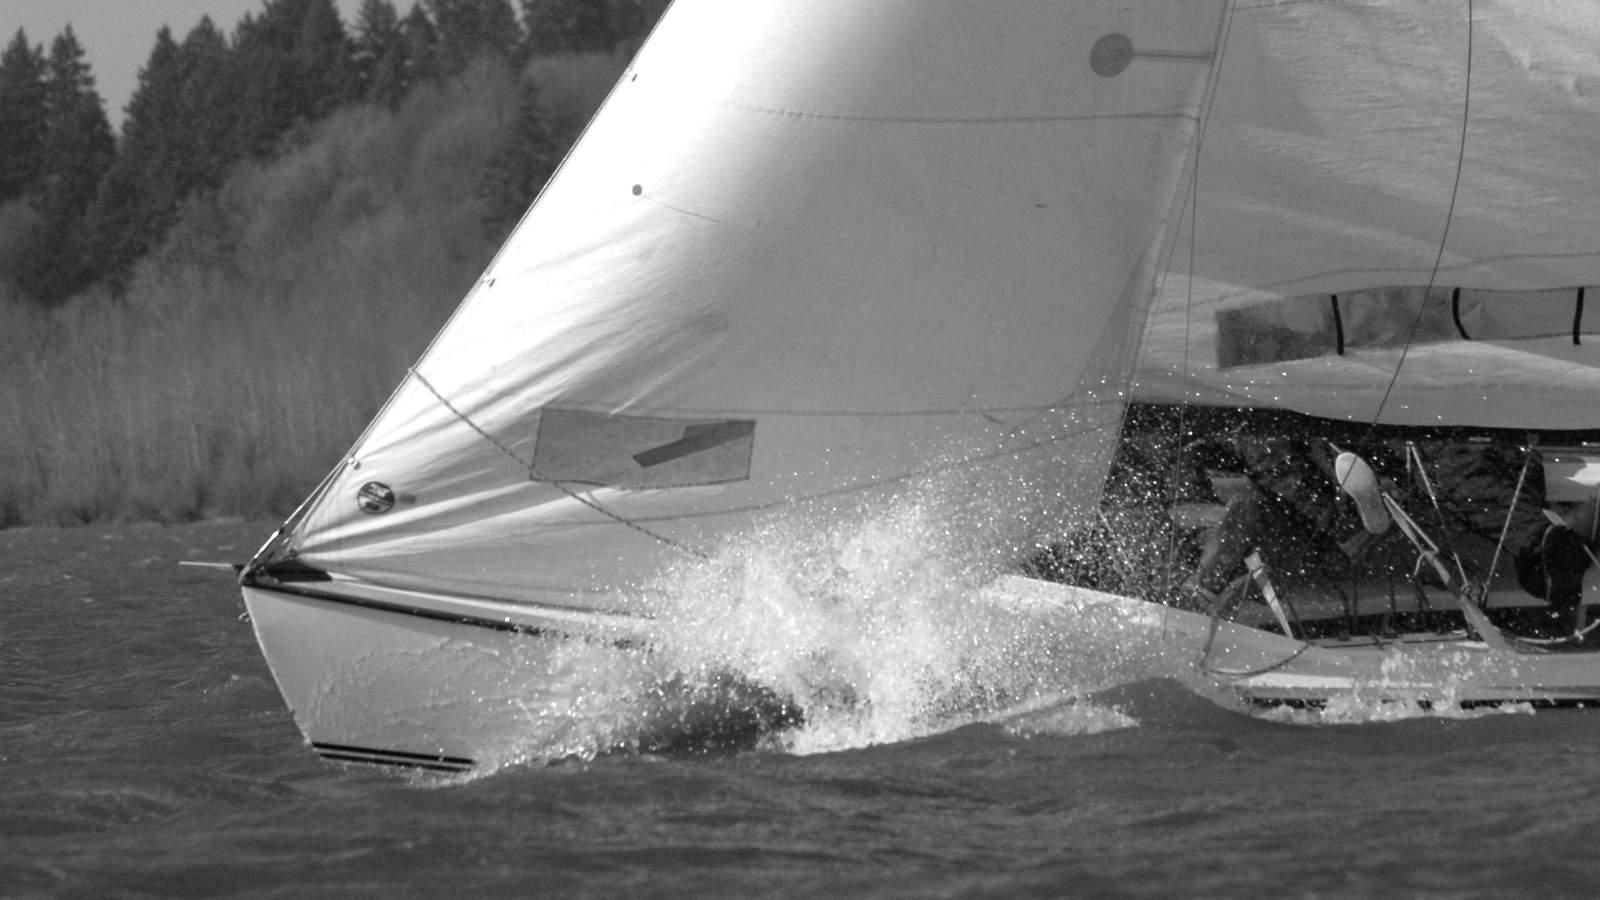 Vancouver Lake Sailing Club